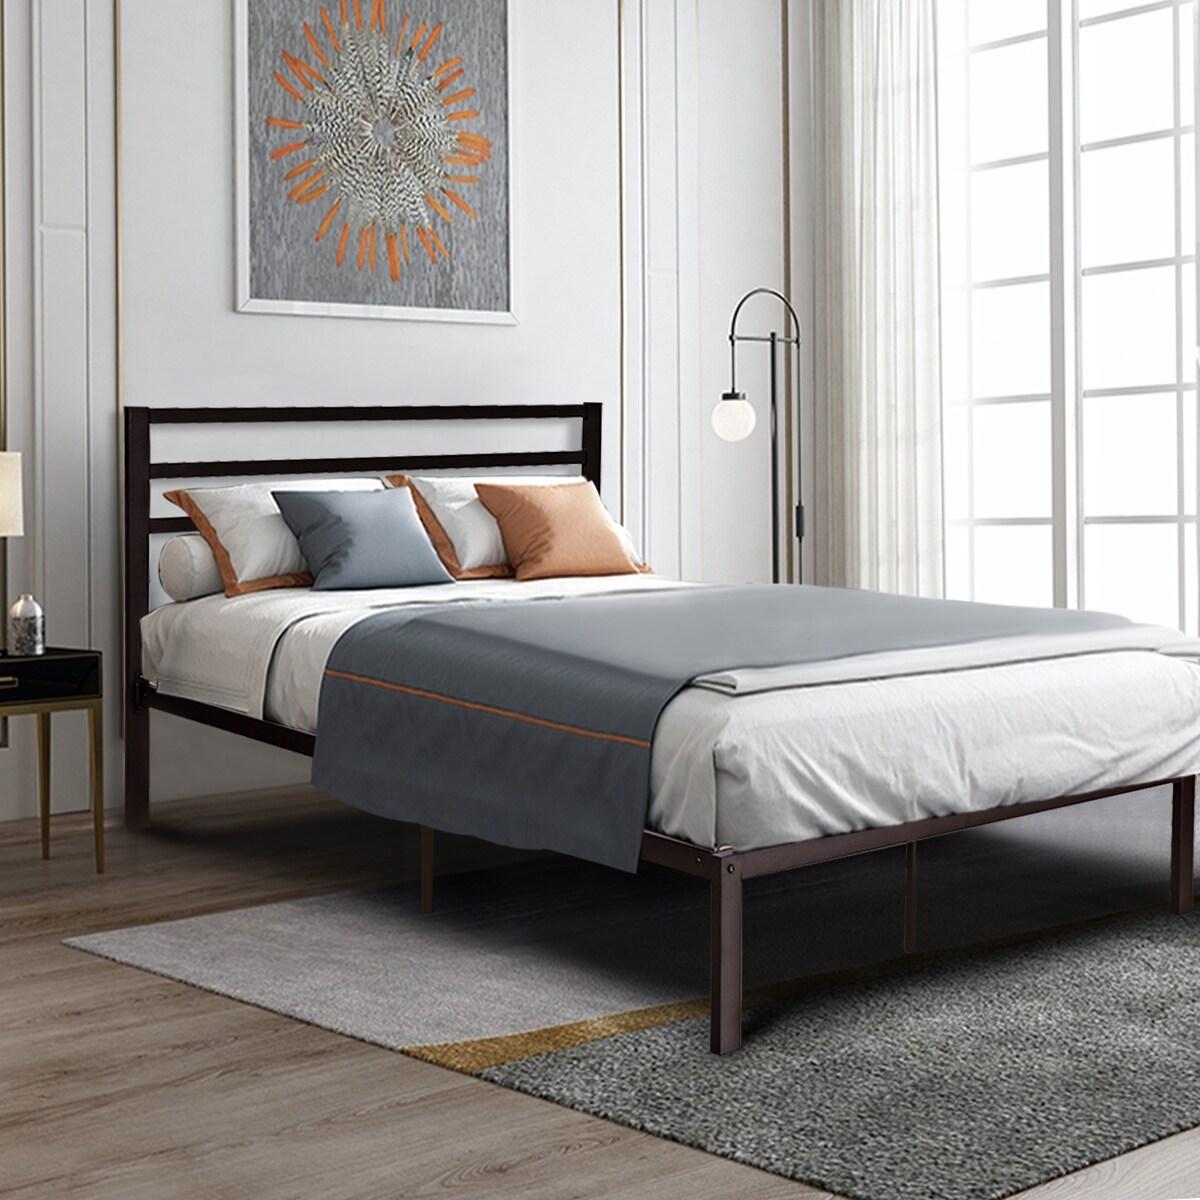 Metal Platform Bed Frame Wooden Slat Support Mattress Foundation Queen Dorm Twin Beds Bed Frames Bedding